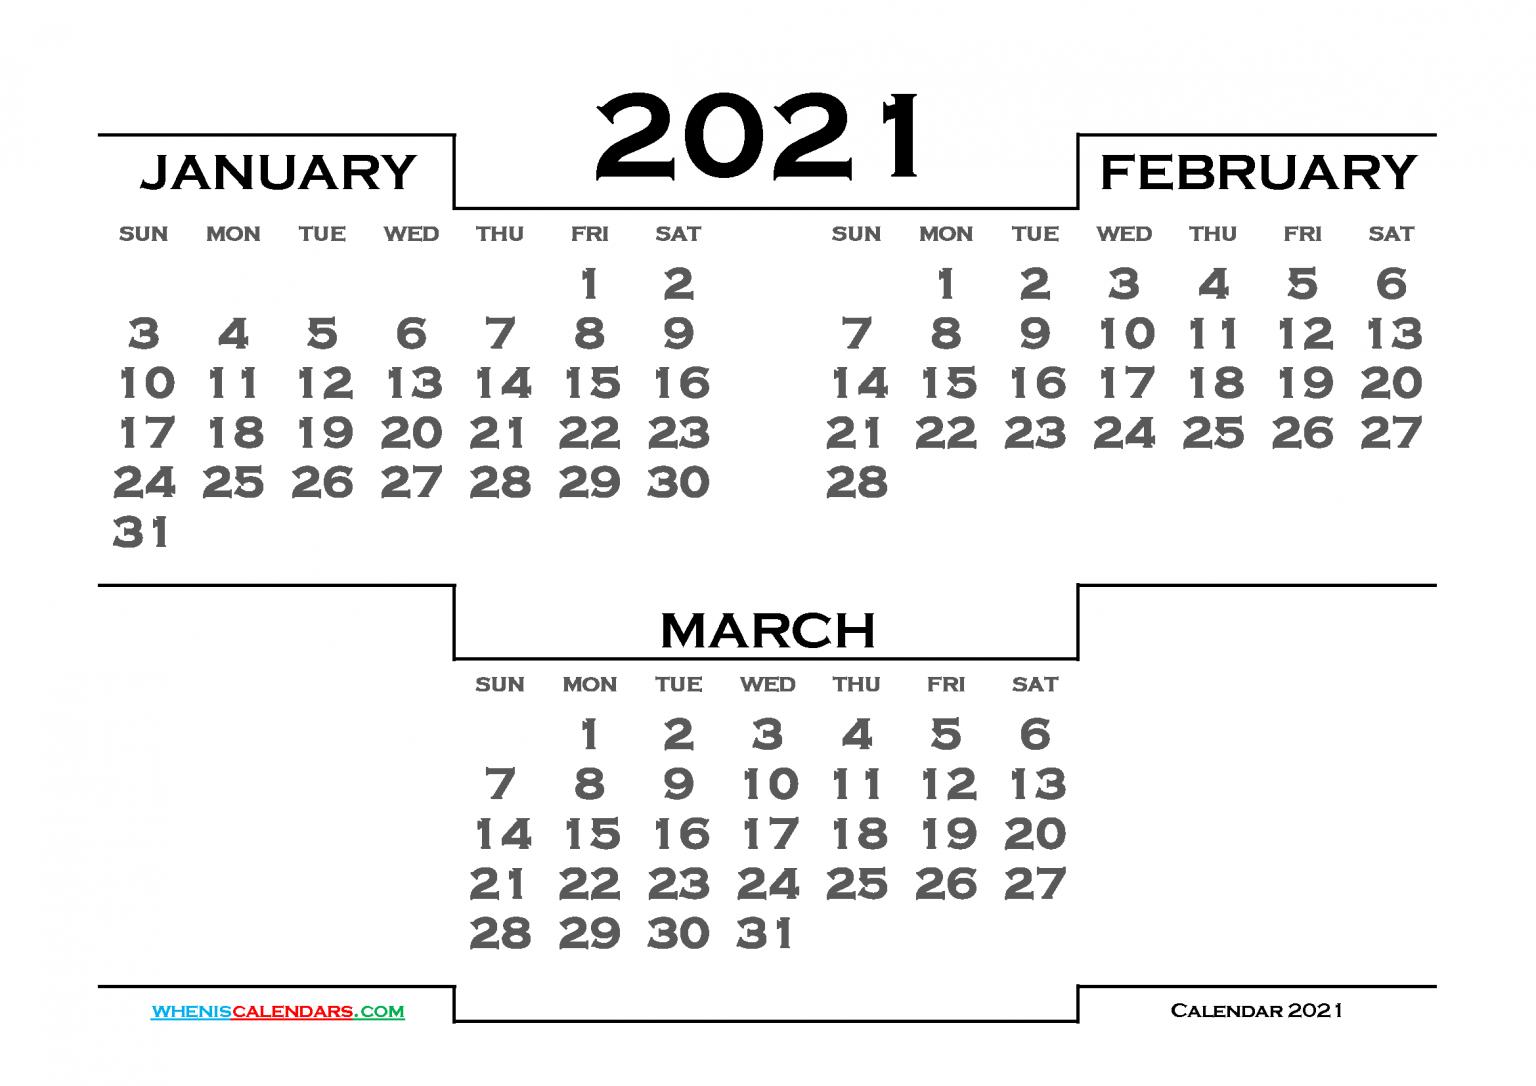 January February March 2021 Calendar Printable 6 Templates For January February March 2021 Calendar